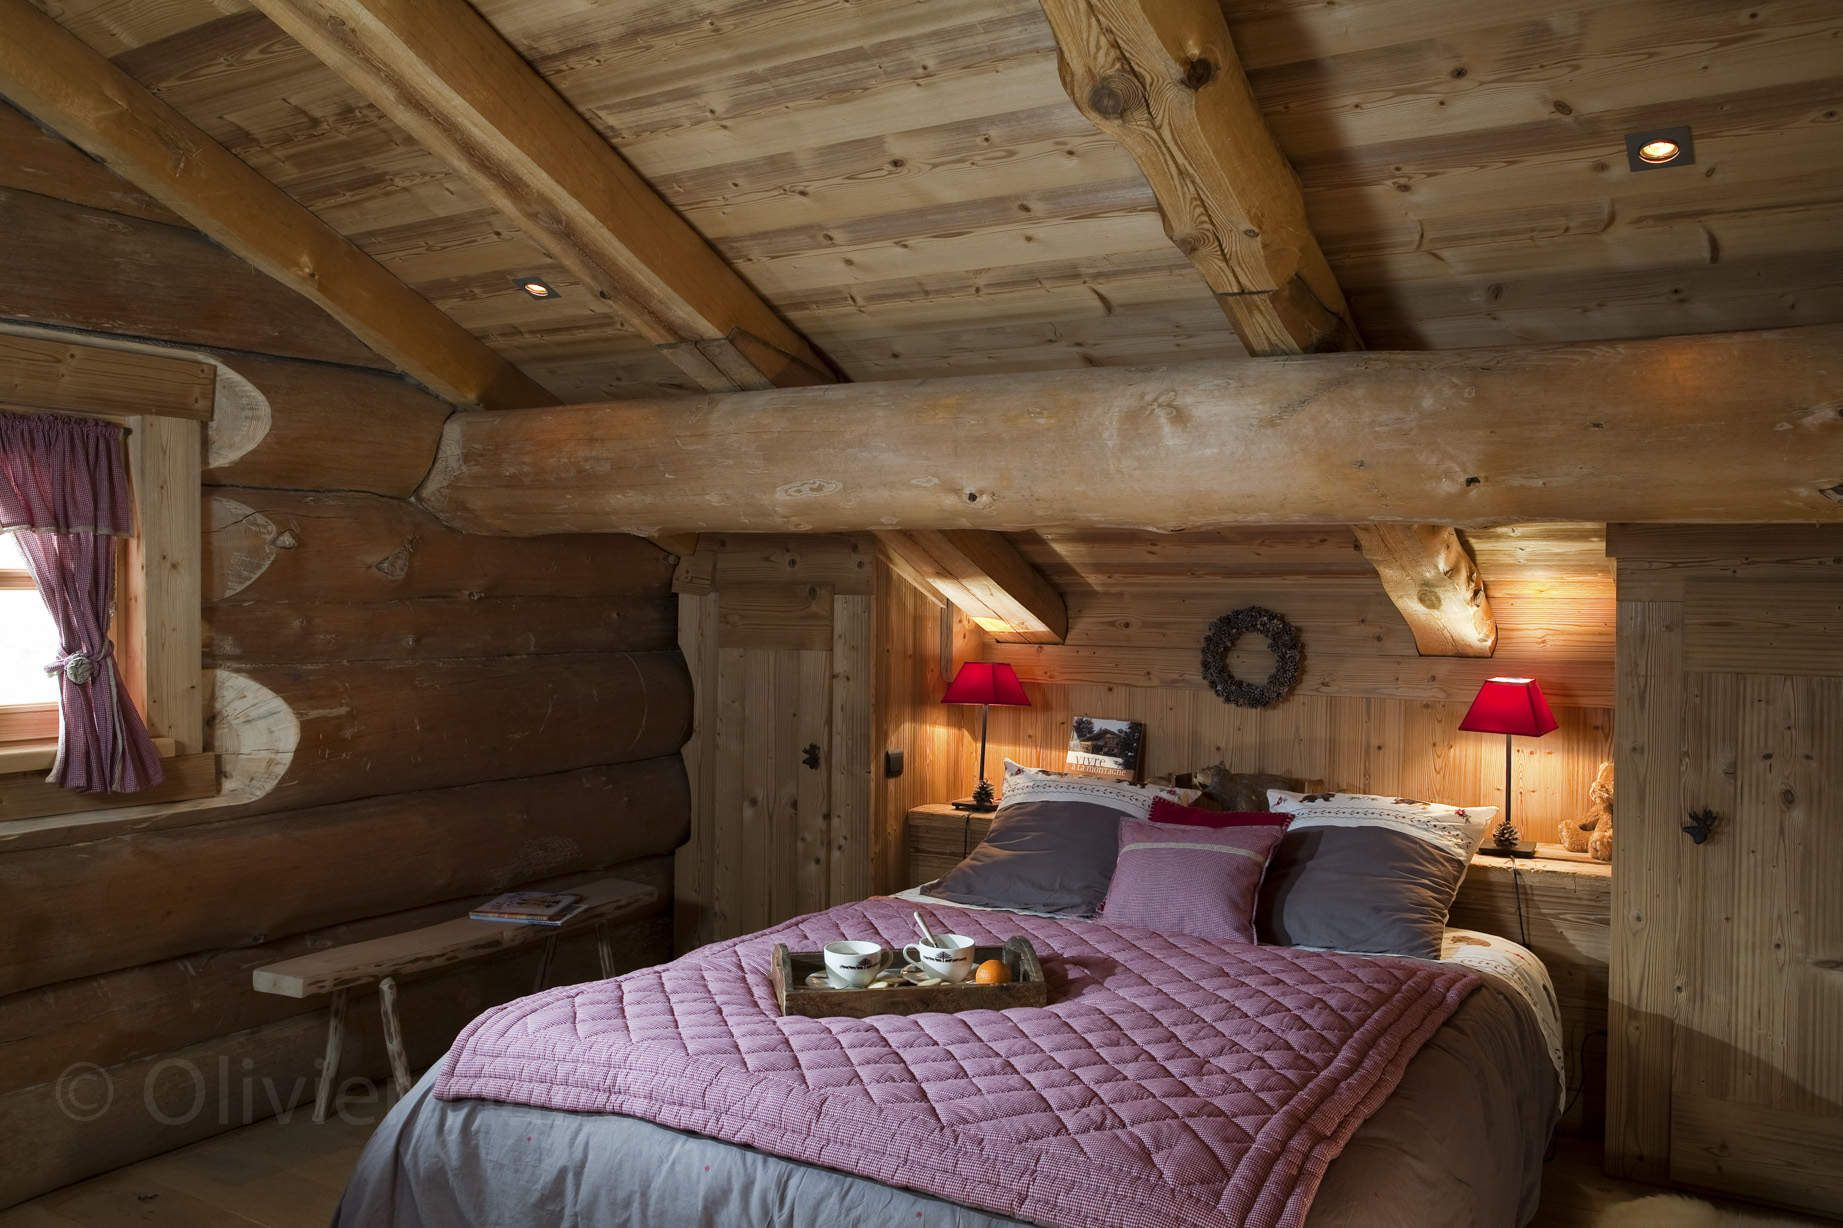 Chalet les pins chambre ambiance chalet in 2019 arredamento baita di montagna arredamento - Chambre en bois ...